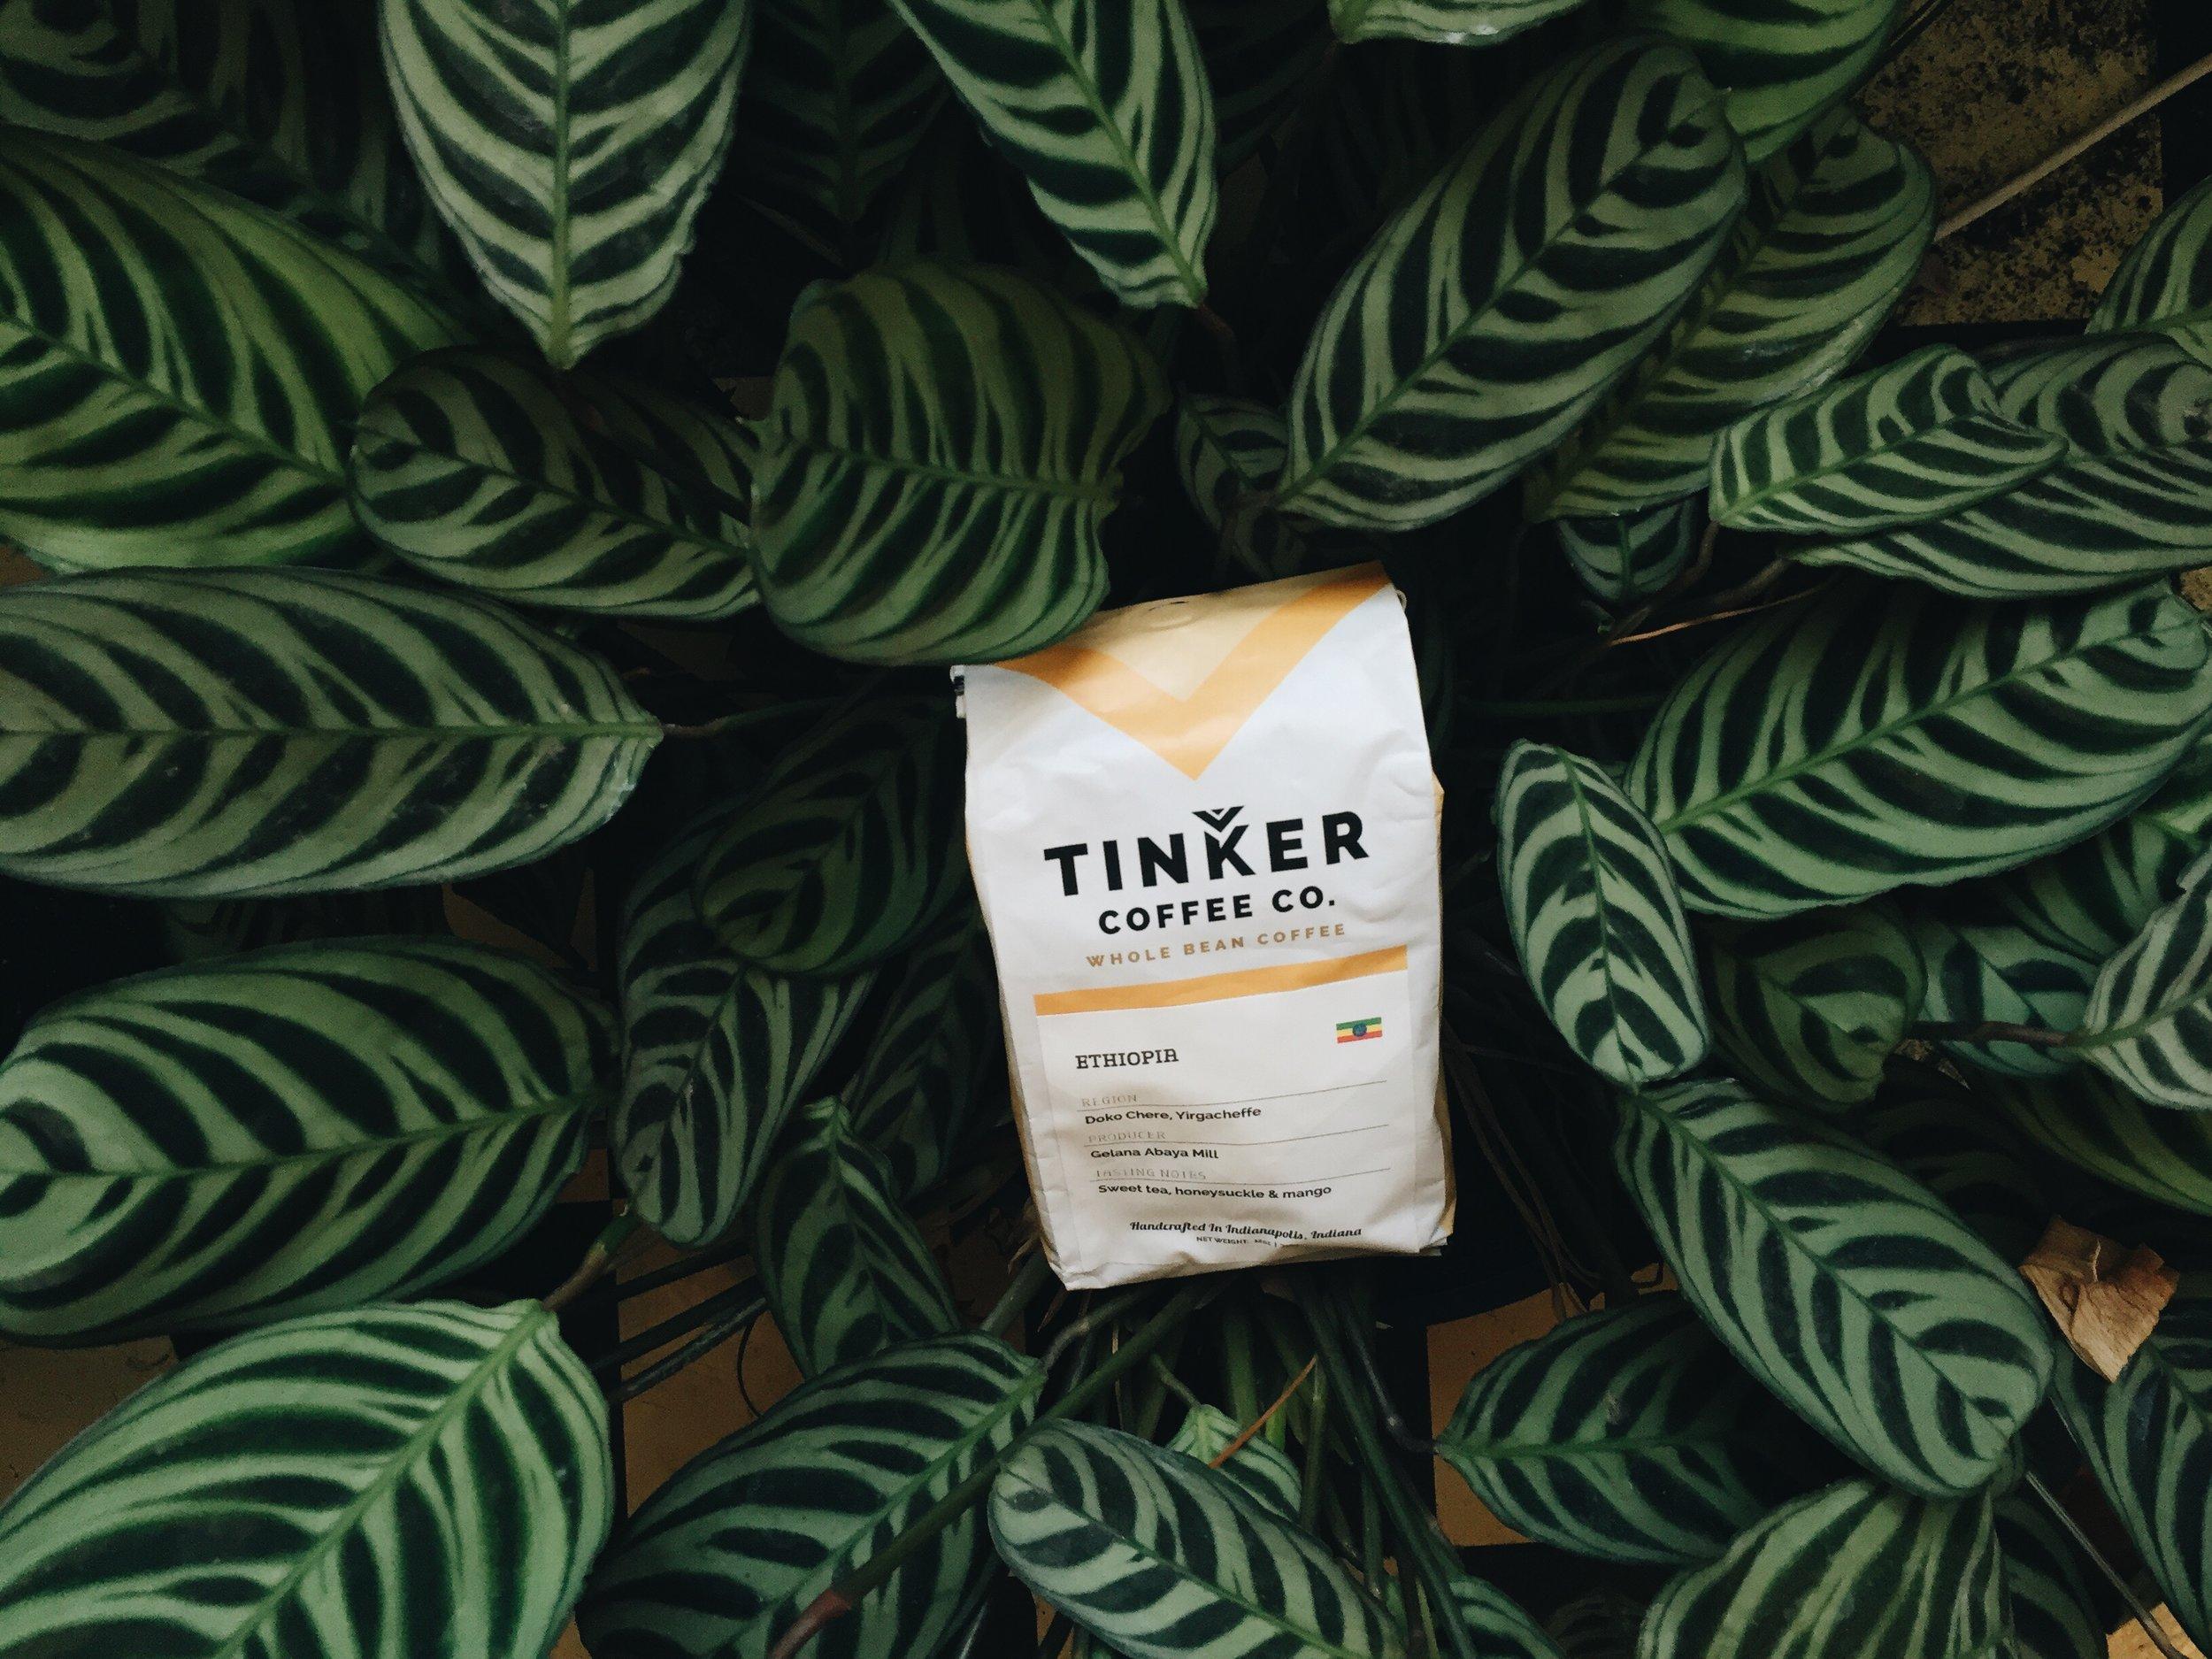 tinker coffee bag leaf